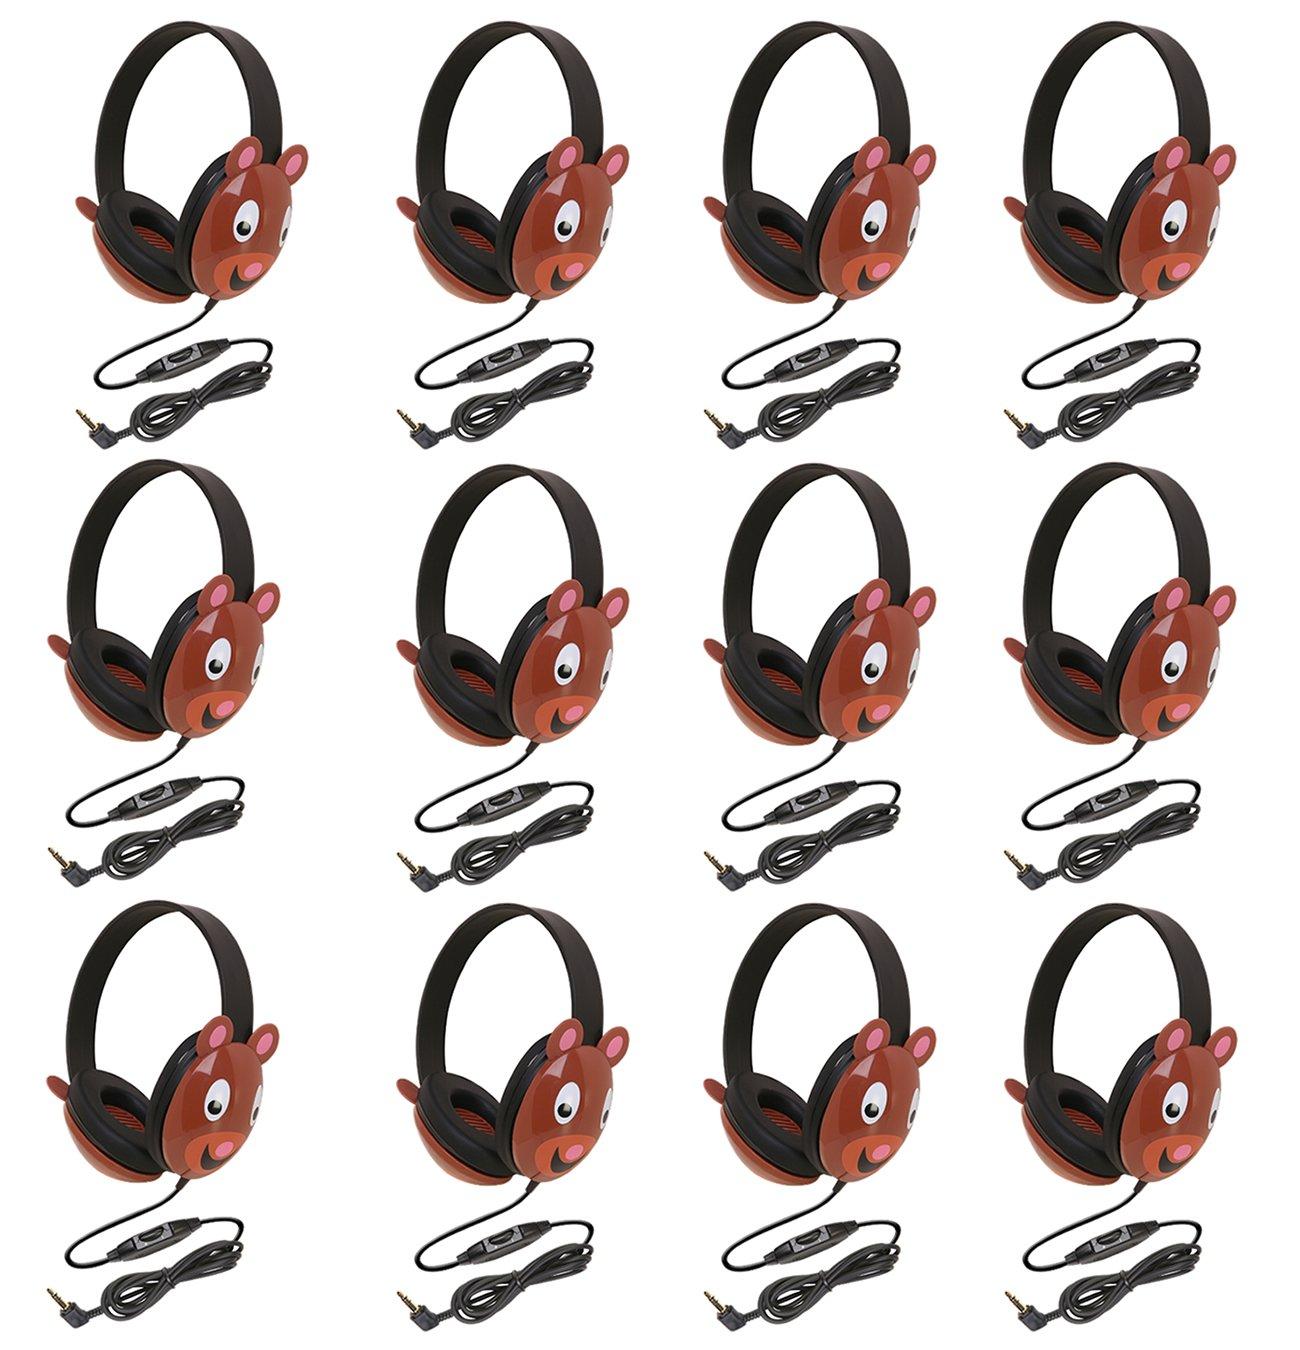 Califone 2810-BE Listening First Stereo Headphone, Bear Motif - Pack of 12